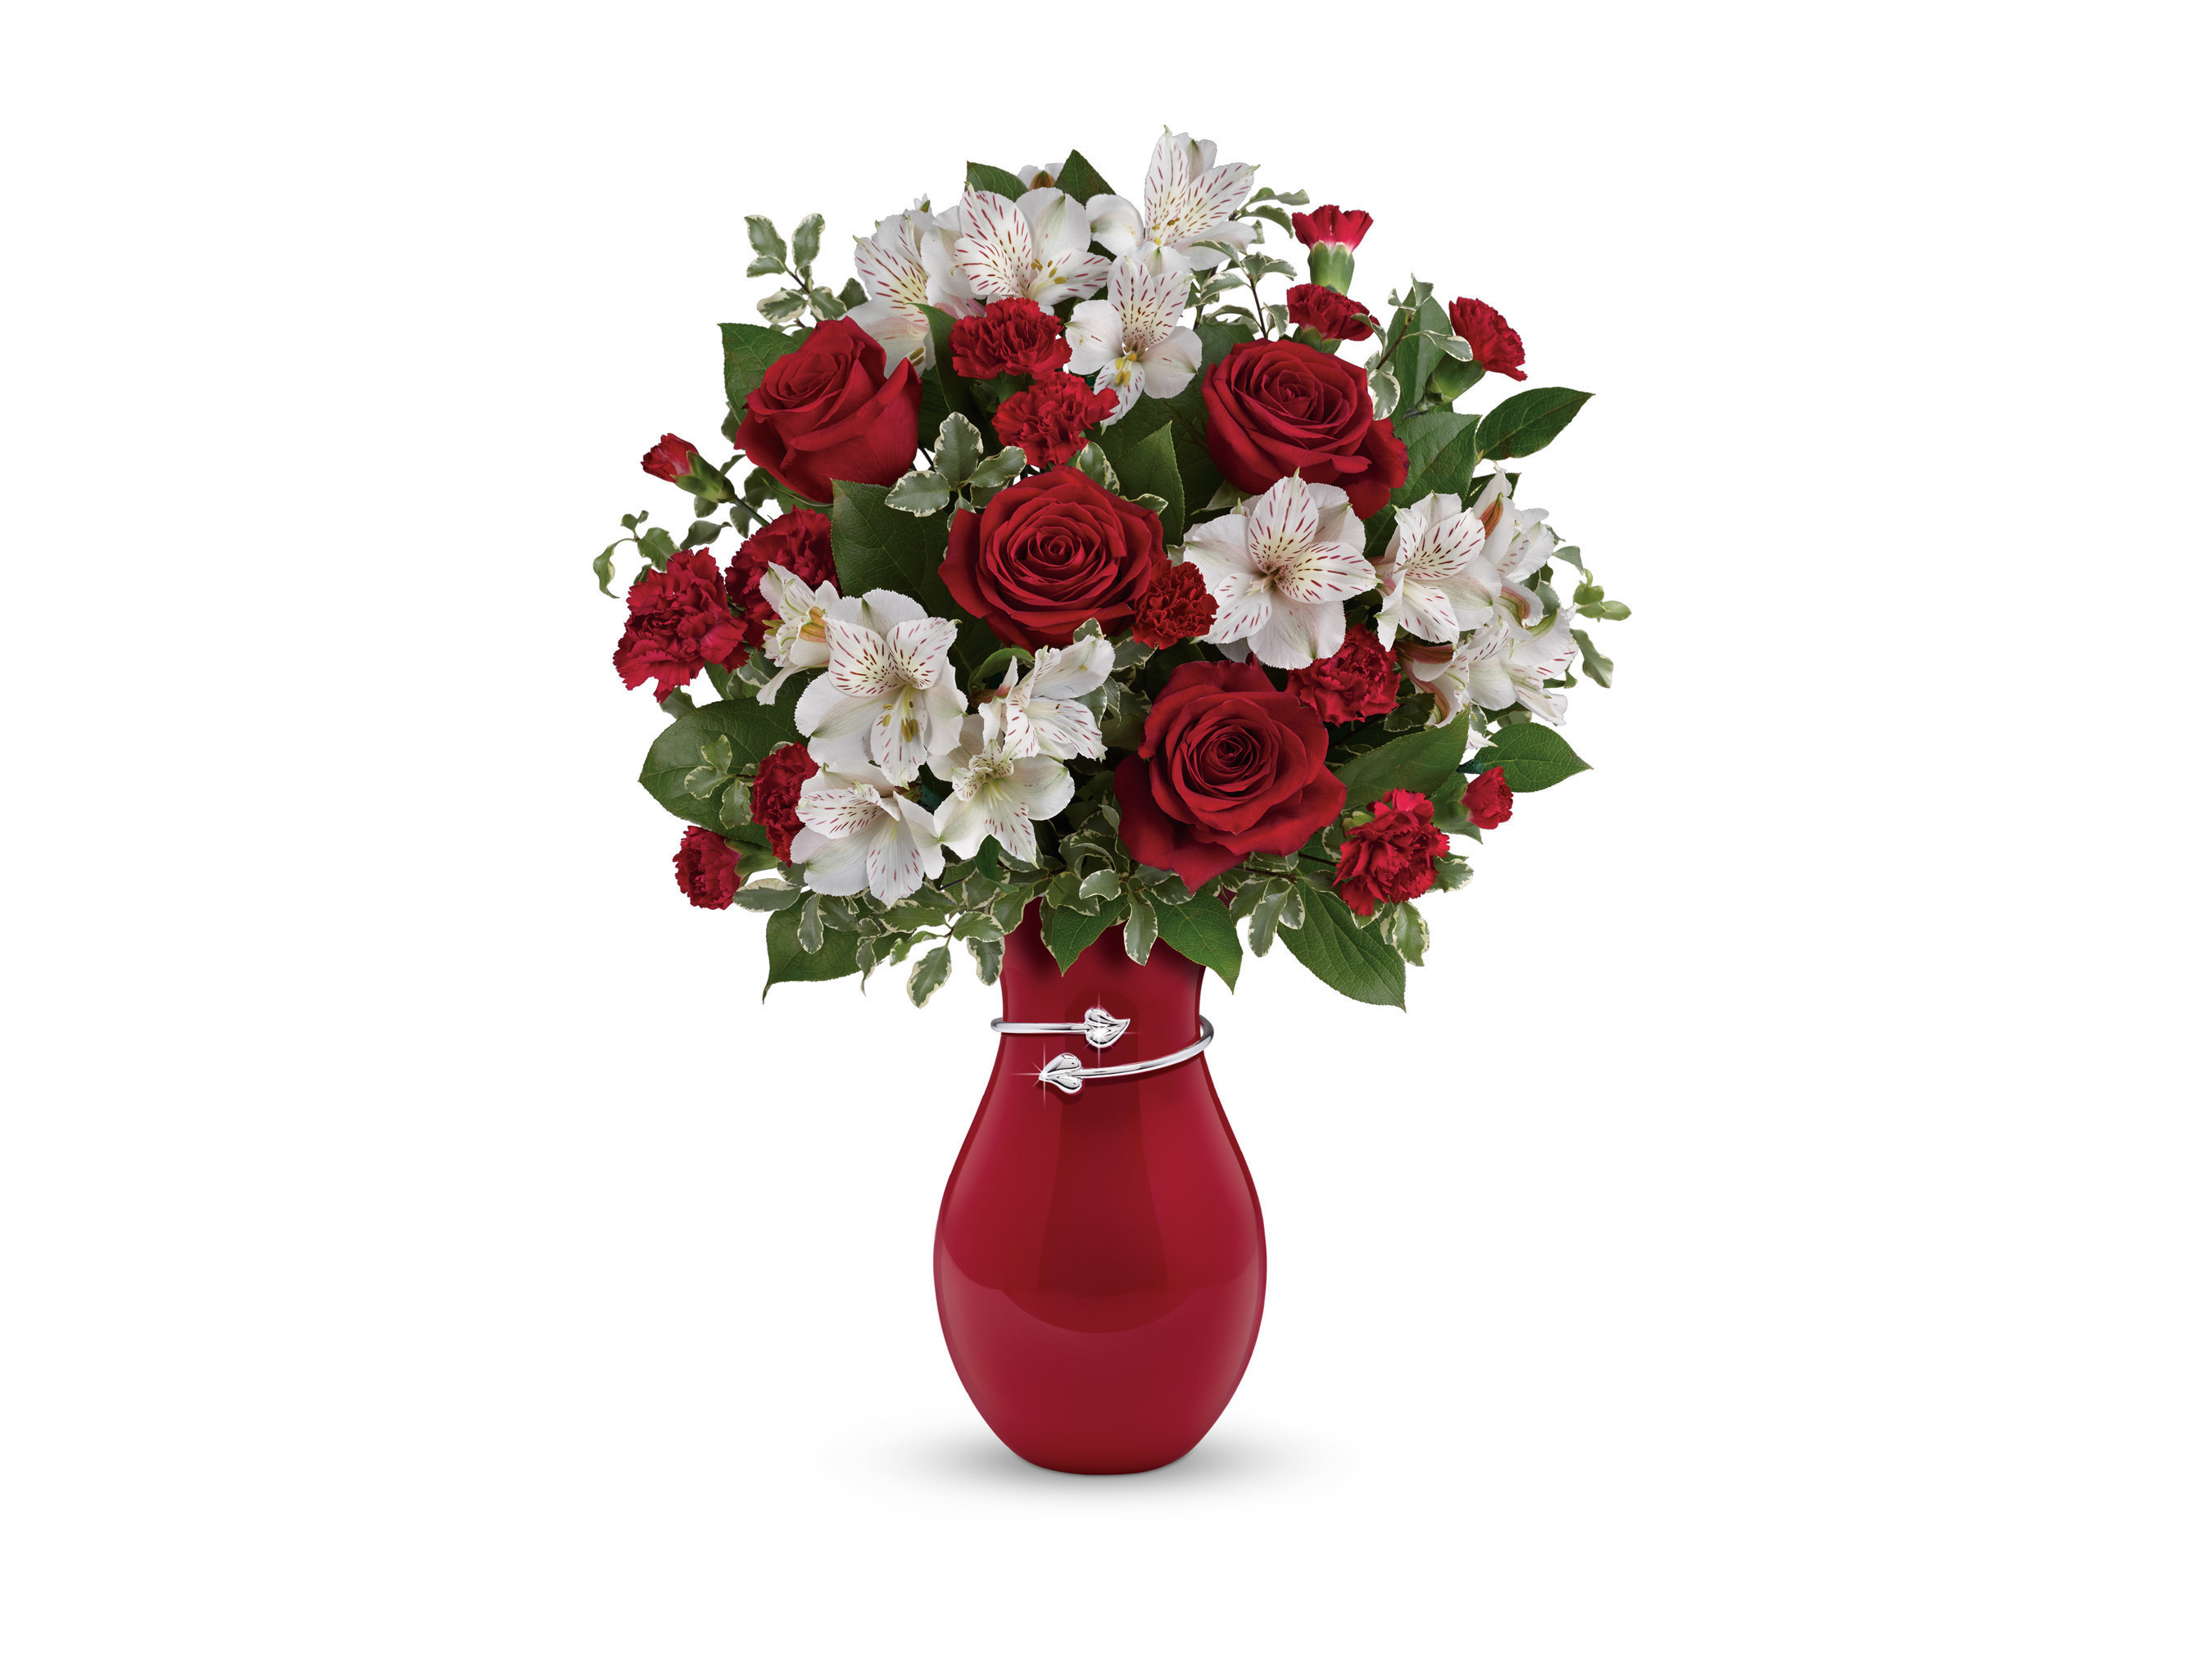 Teleflora's NEW Pair of Hearts Bouquet. Photo courtesy of Teleflora.